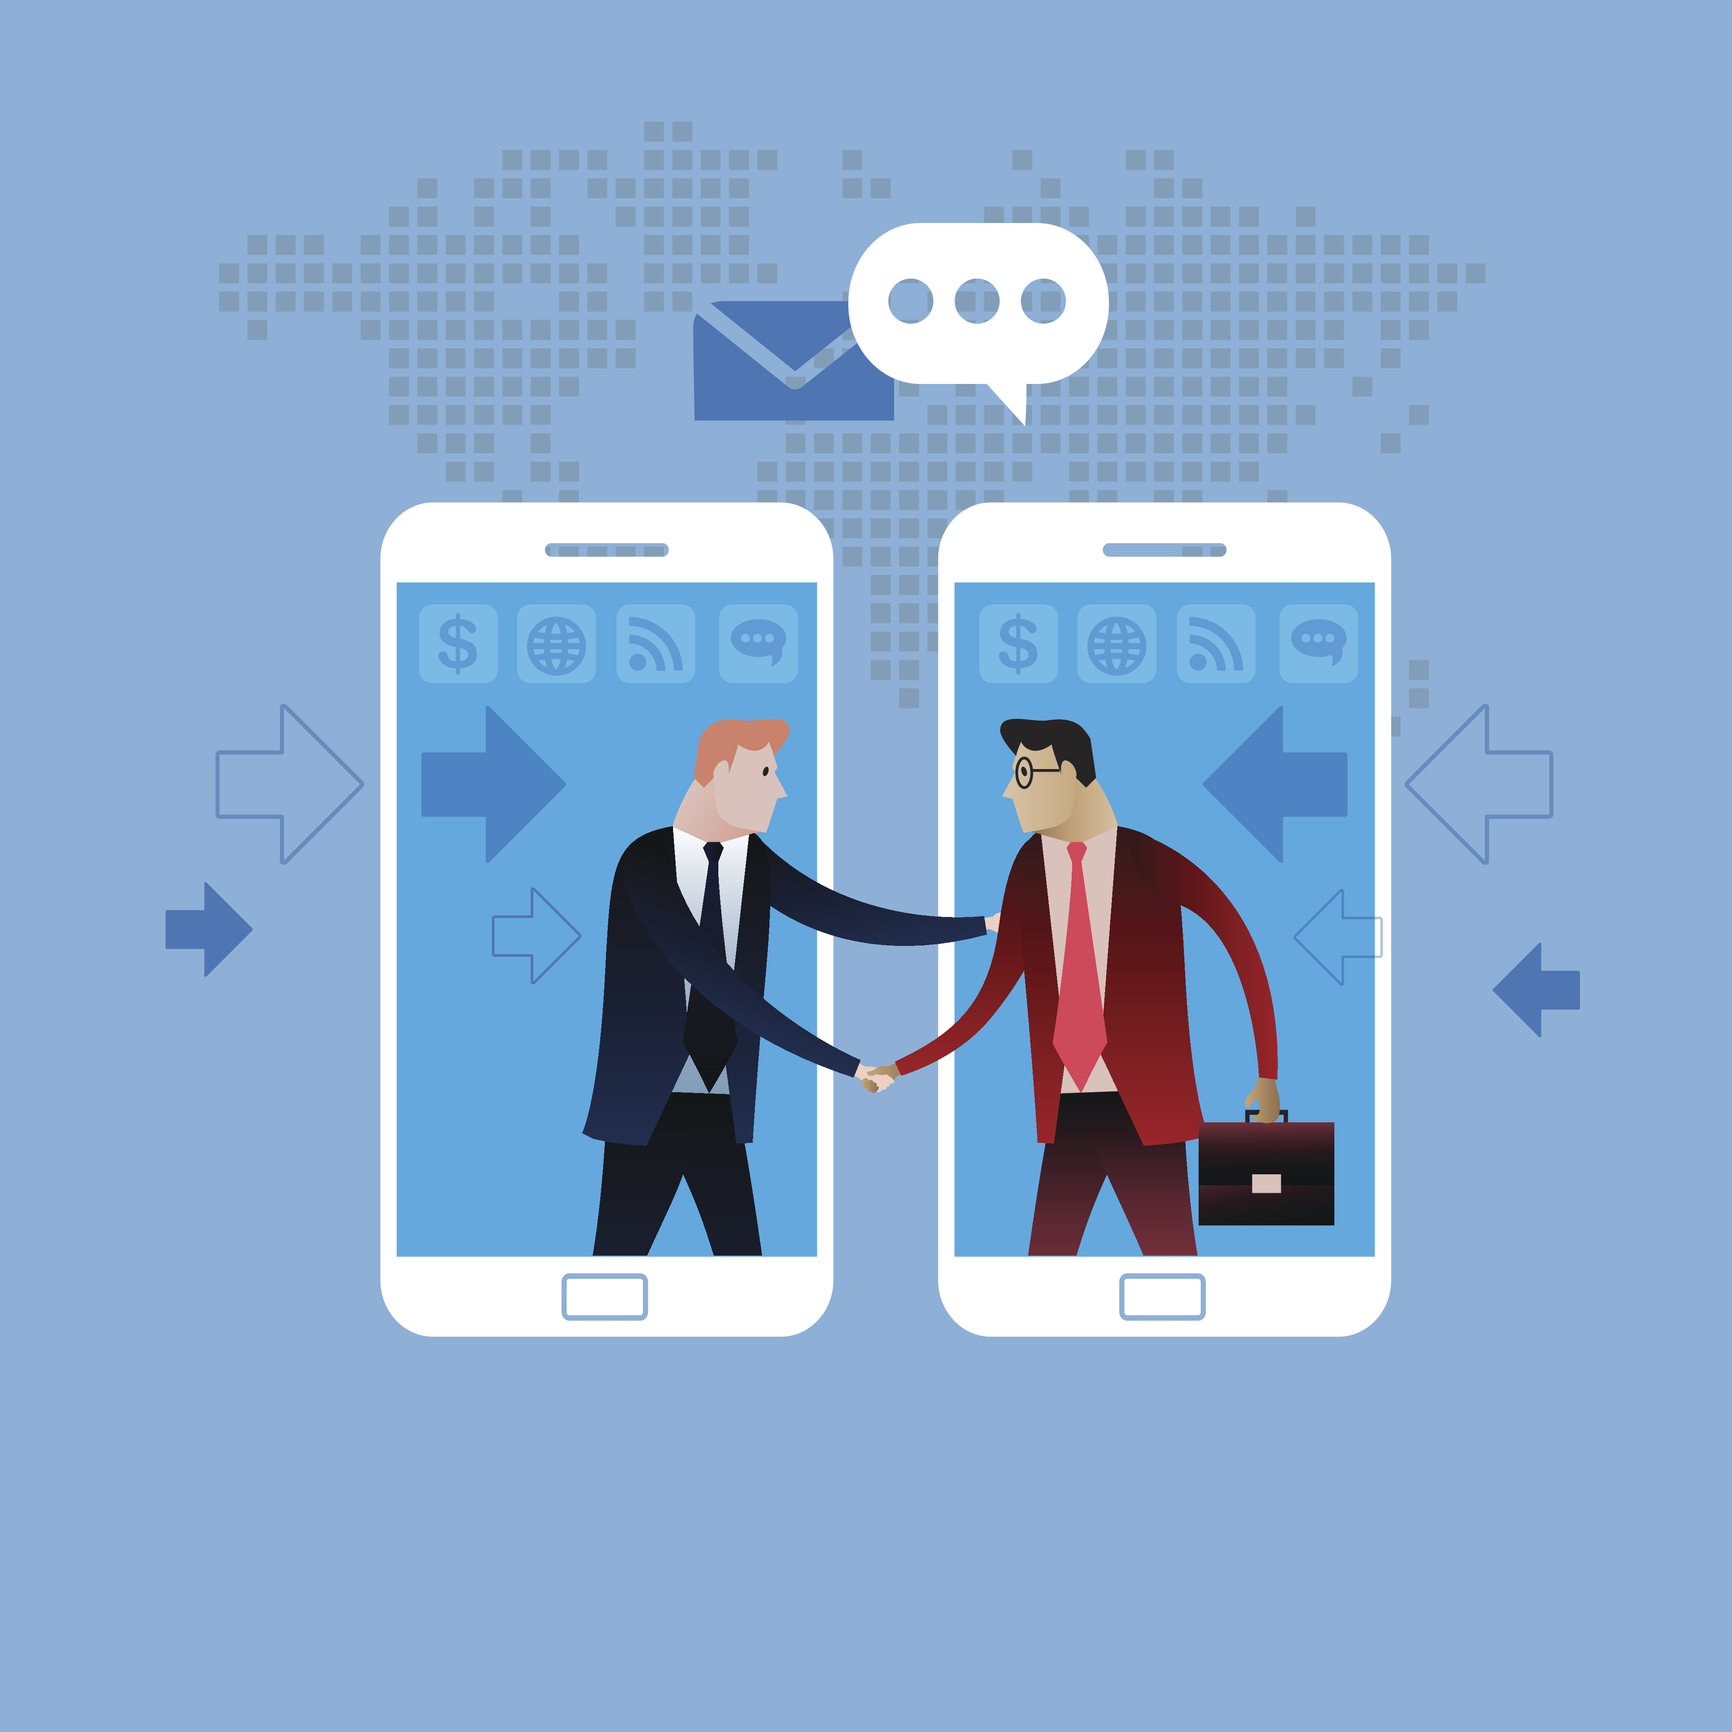 E-commerce delegation - 5 reasons to delegate